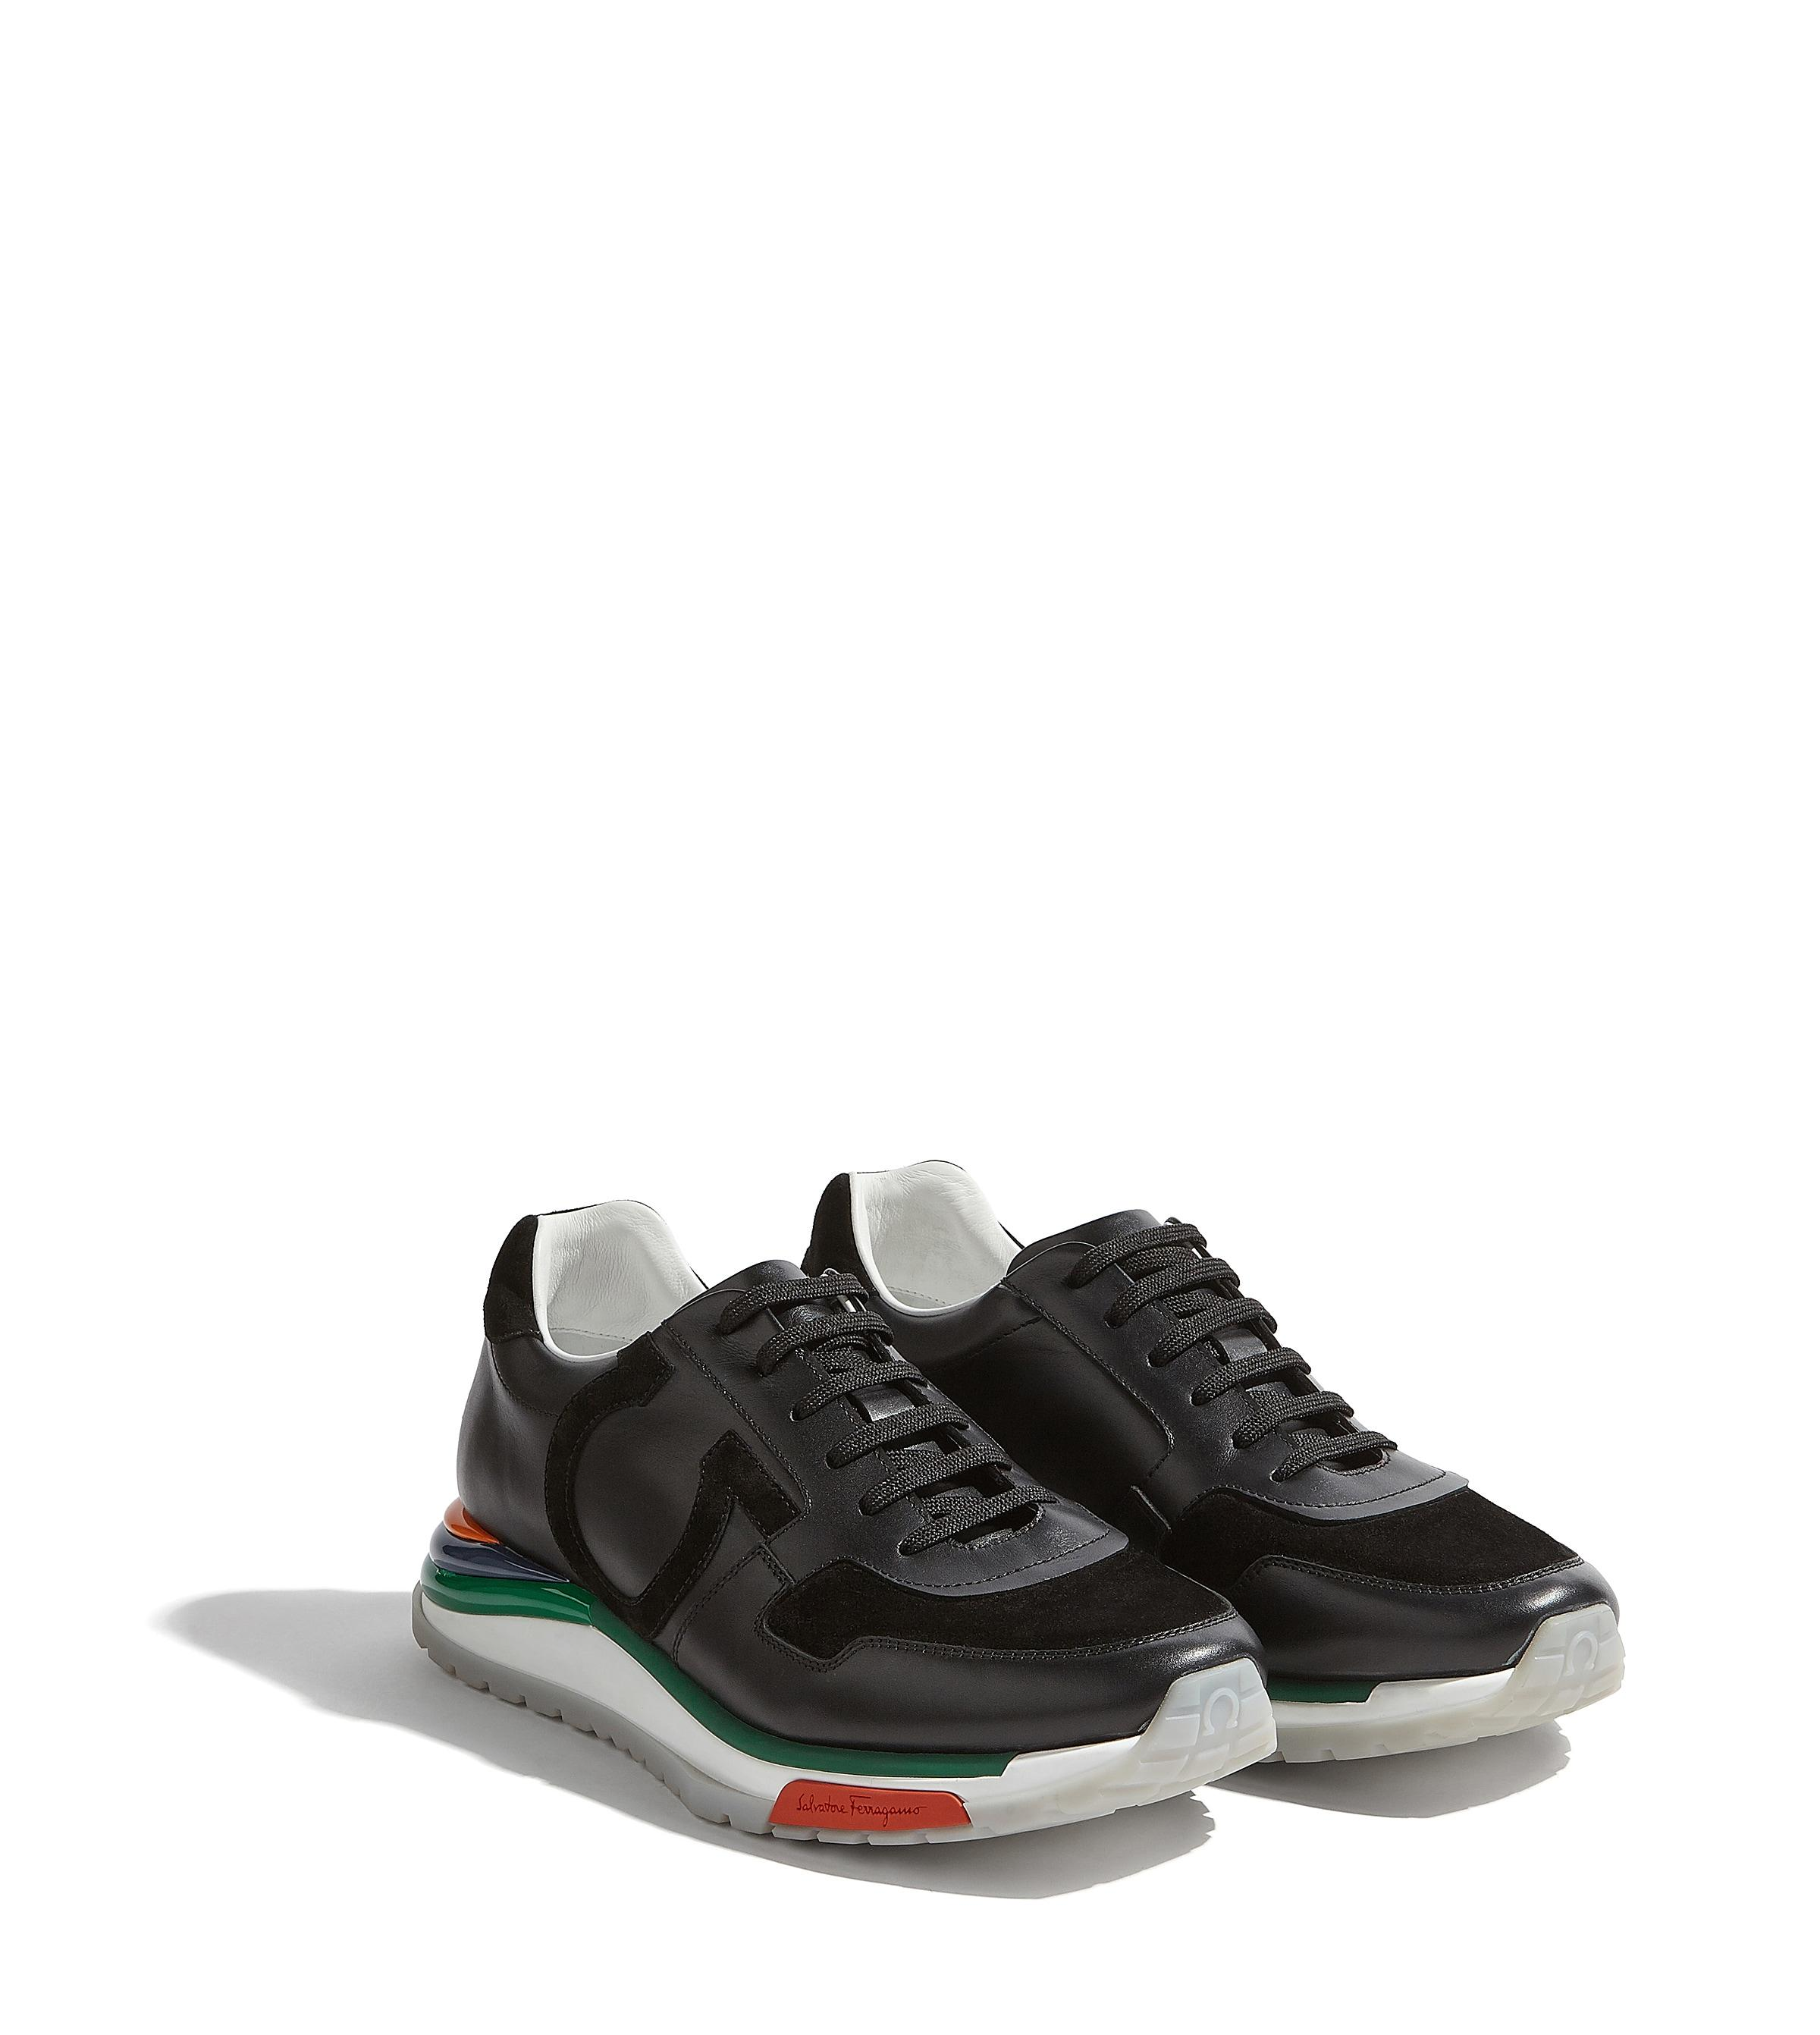 00fbd0cc203 Lyst - Ferragamo Gancini Rainbow Sneaker in Black for Men